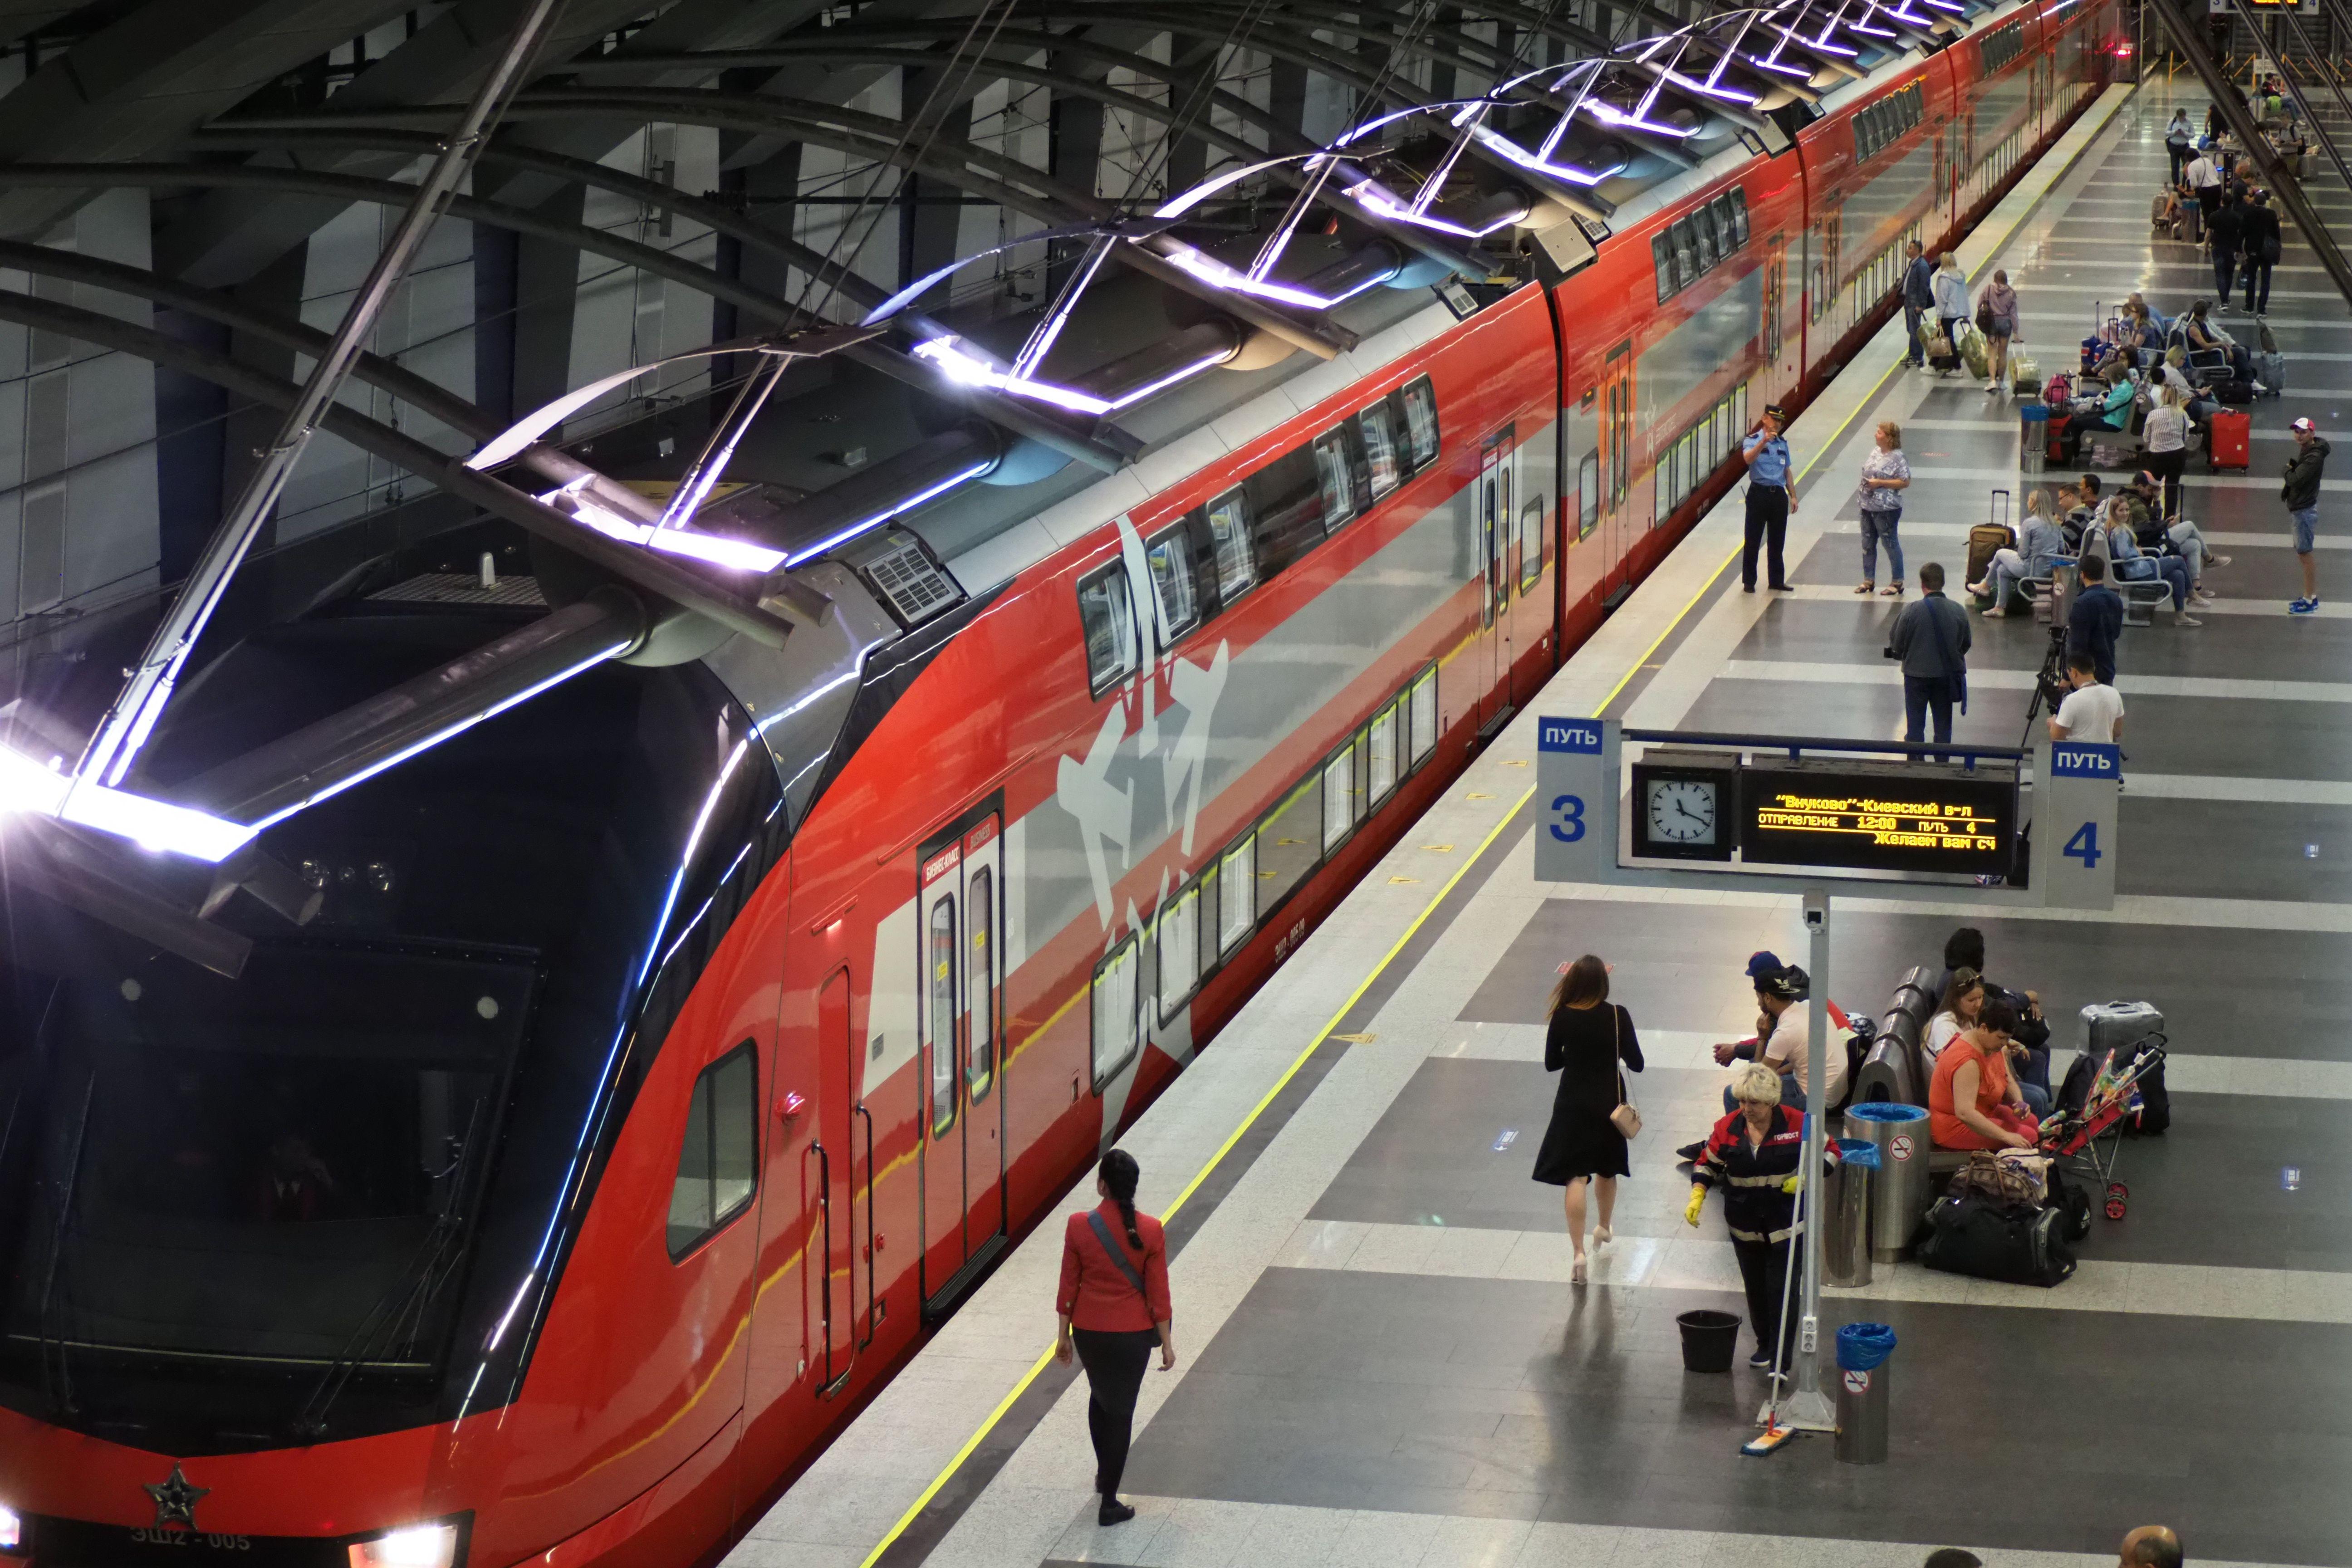 На территории аэропорта «Внуково» построят станцию метро. Фото: Антон Гердо, «Вечерняя Москва»